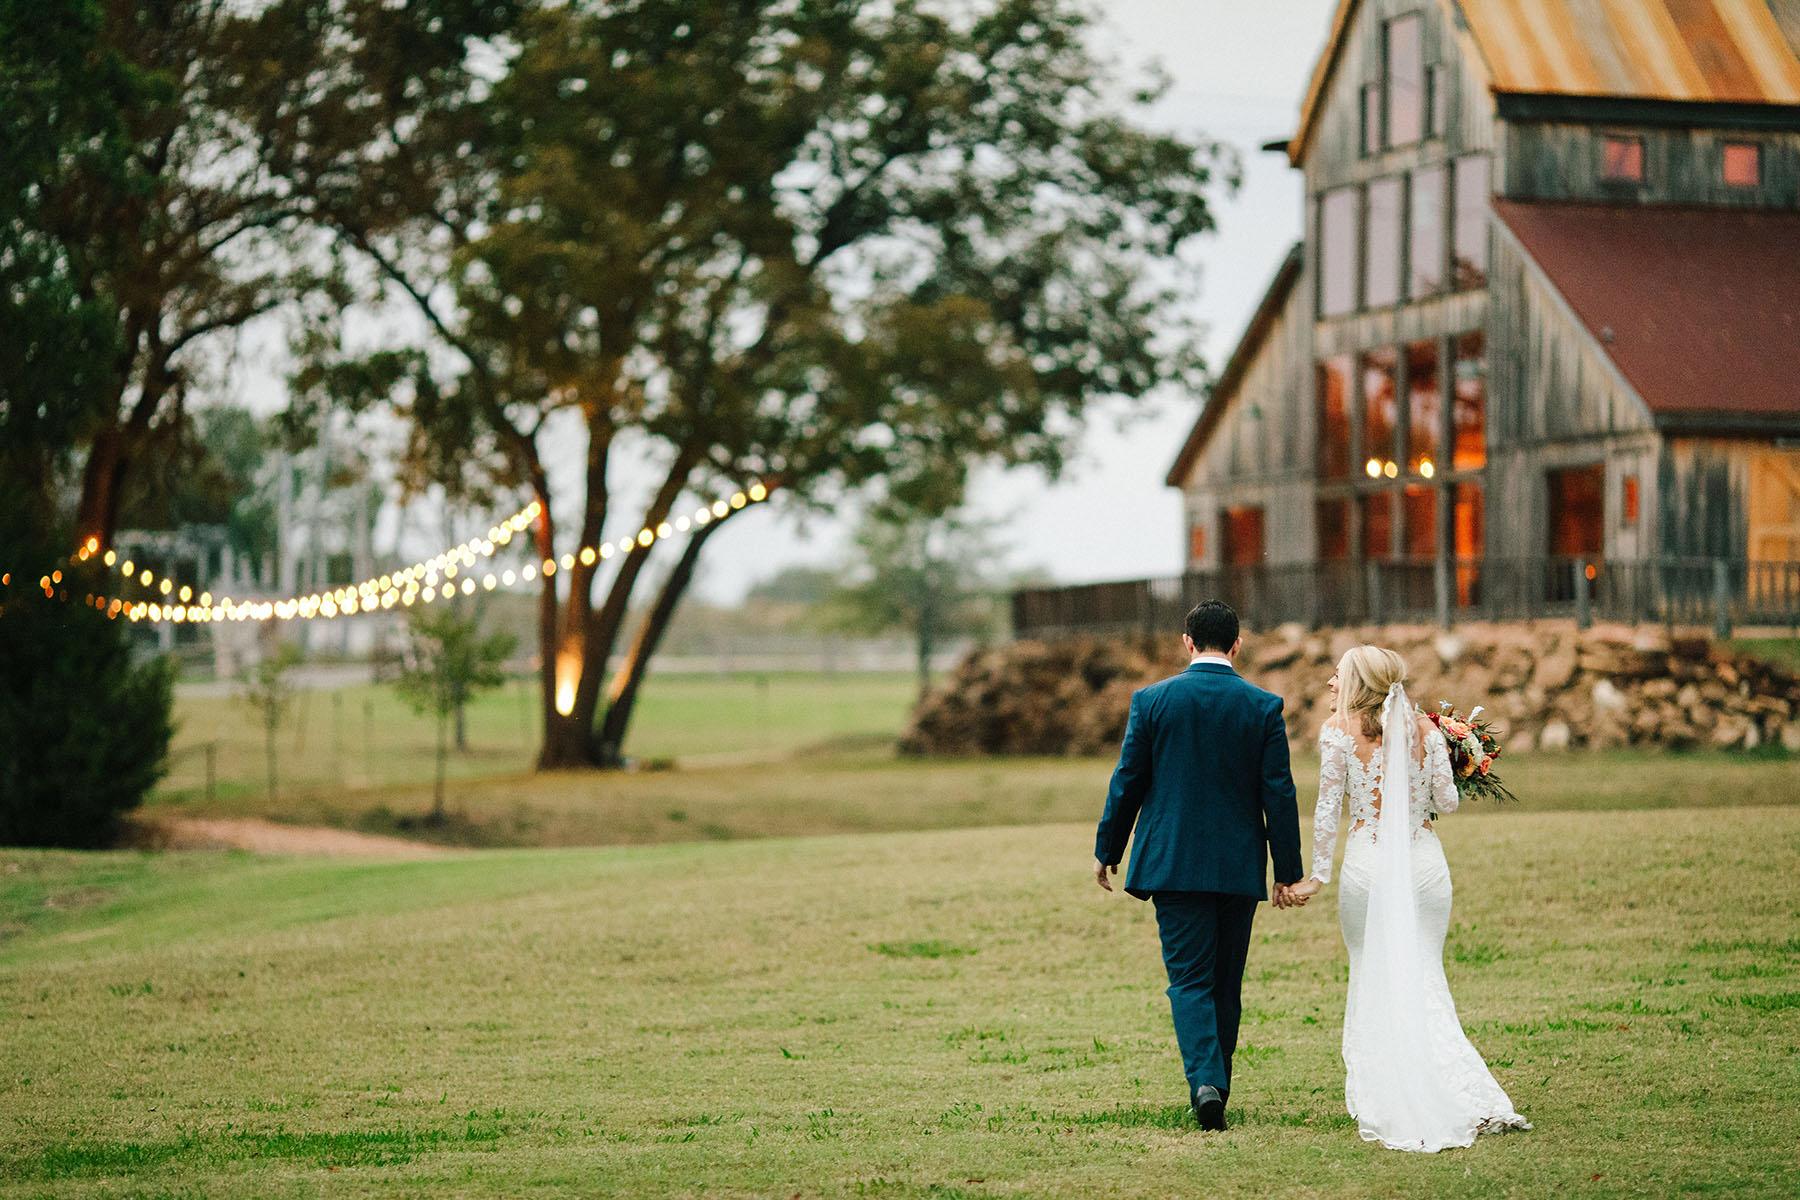 lauren_chad_wedding-132.jpg